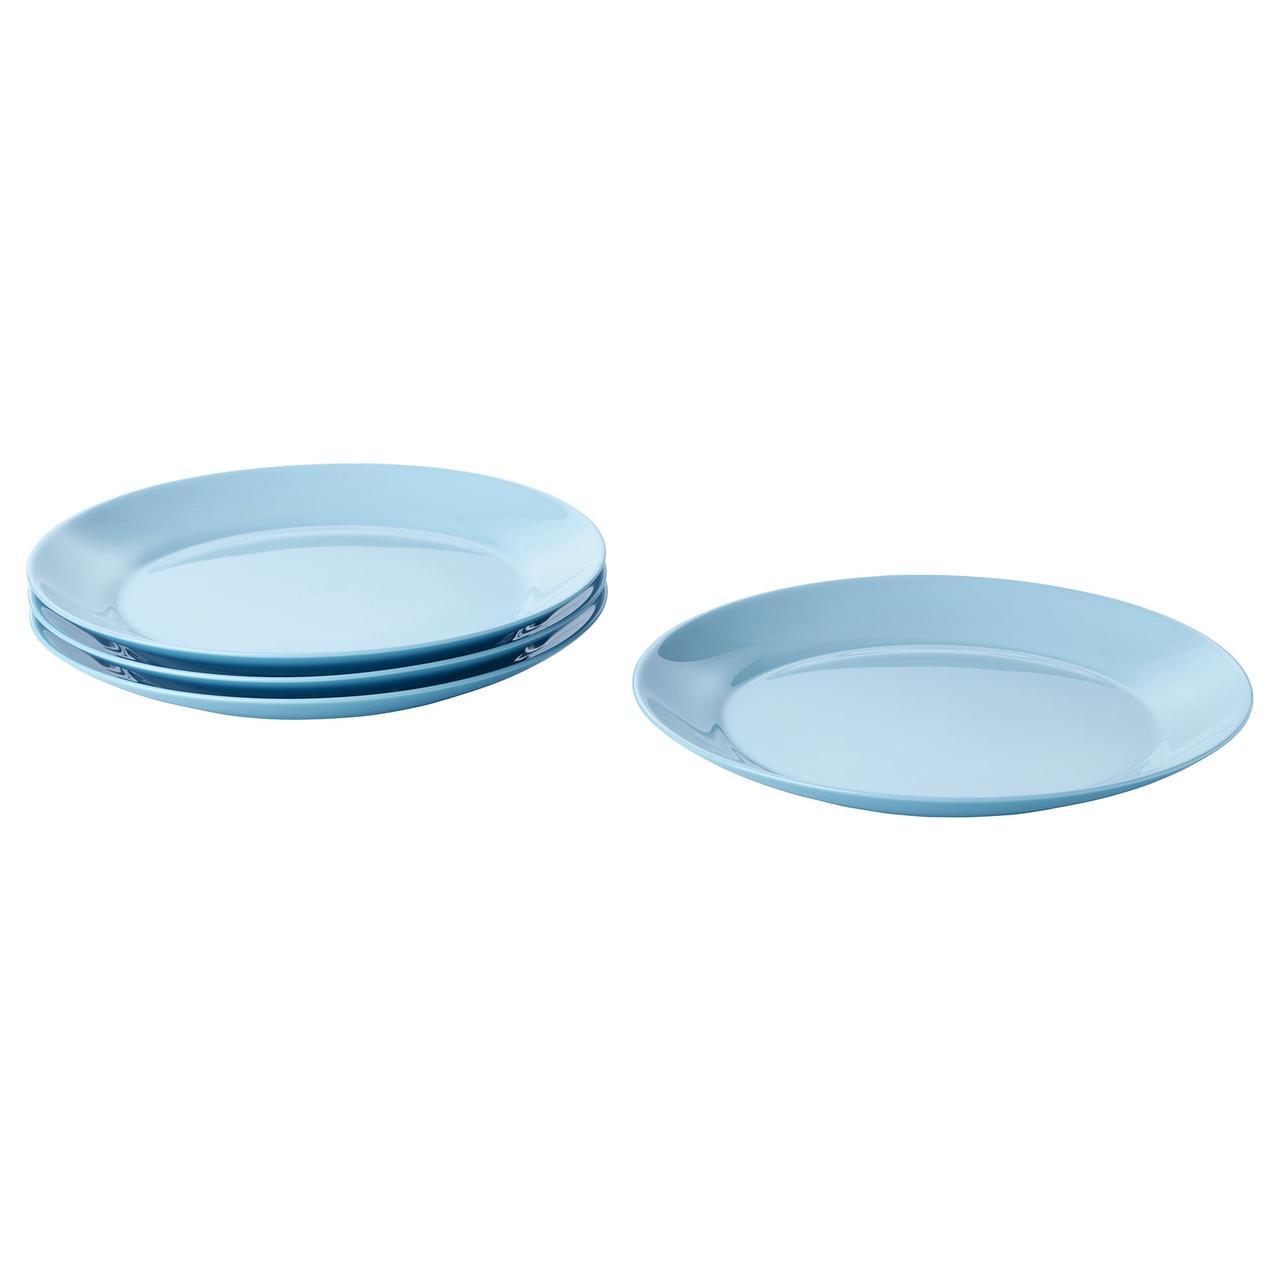 БЕСЕГРА Тарелка десертная, голубой